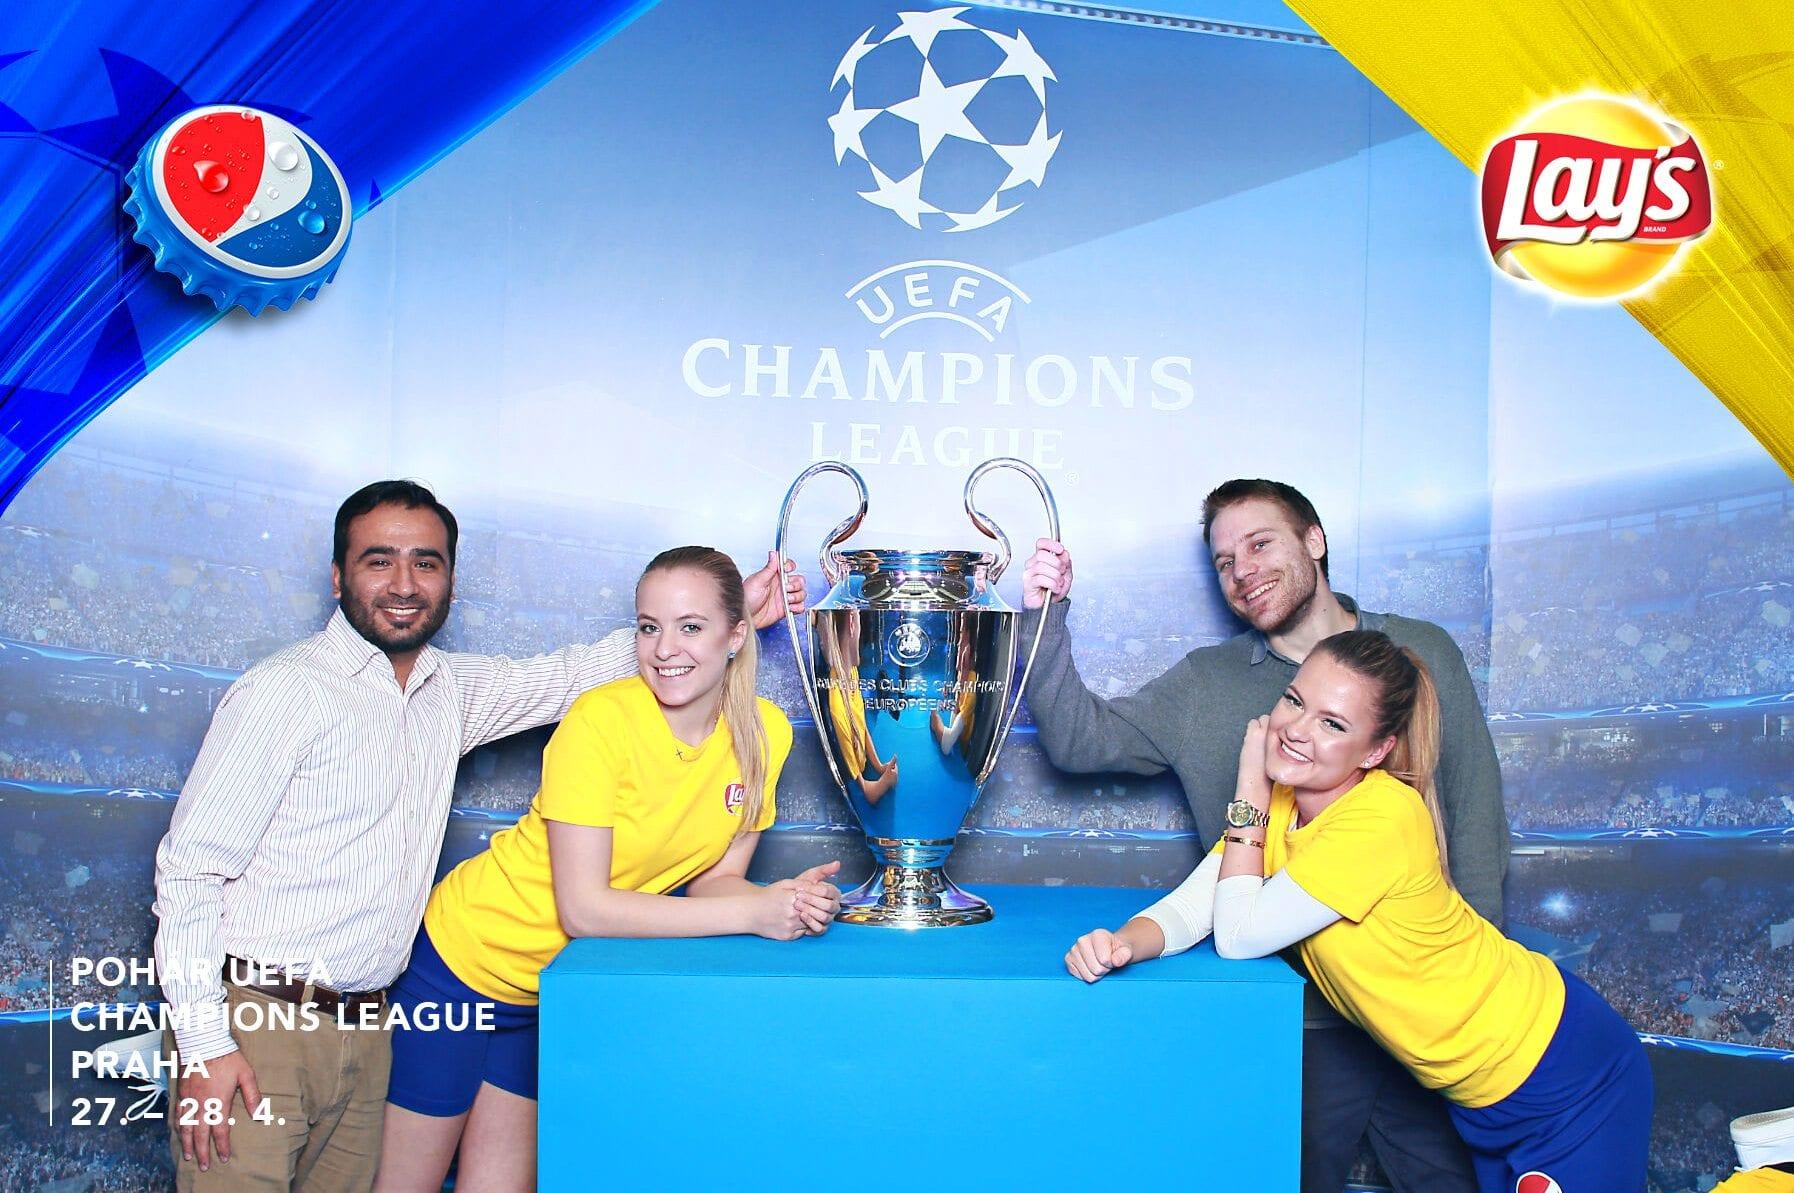 fotokoutek-uefa-27-4-2017-239179